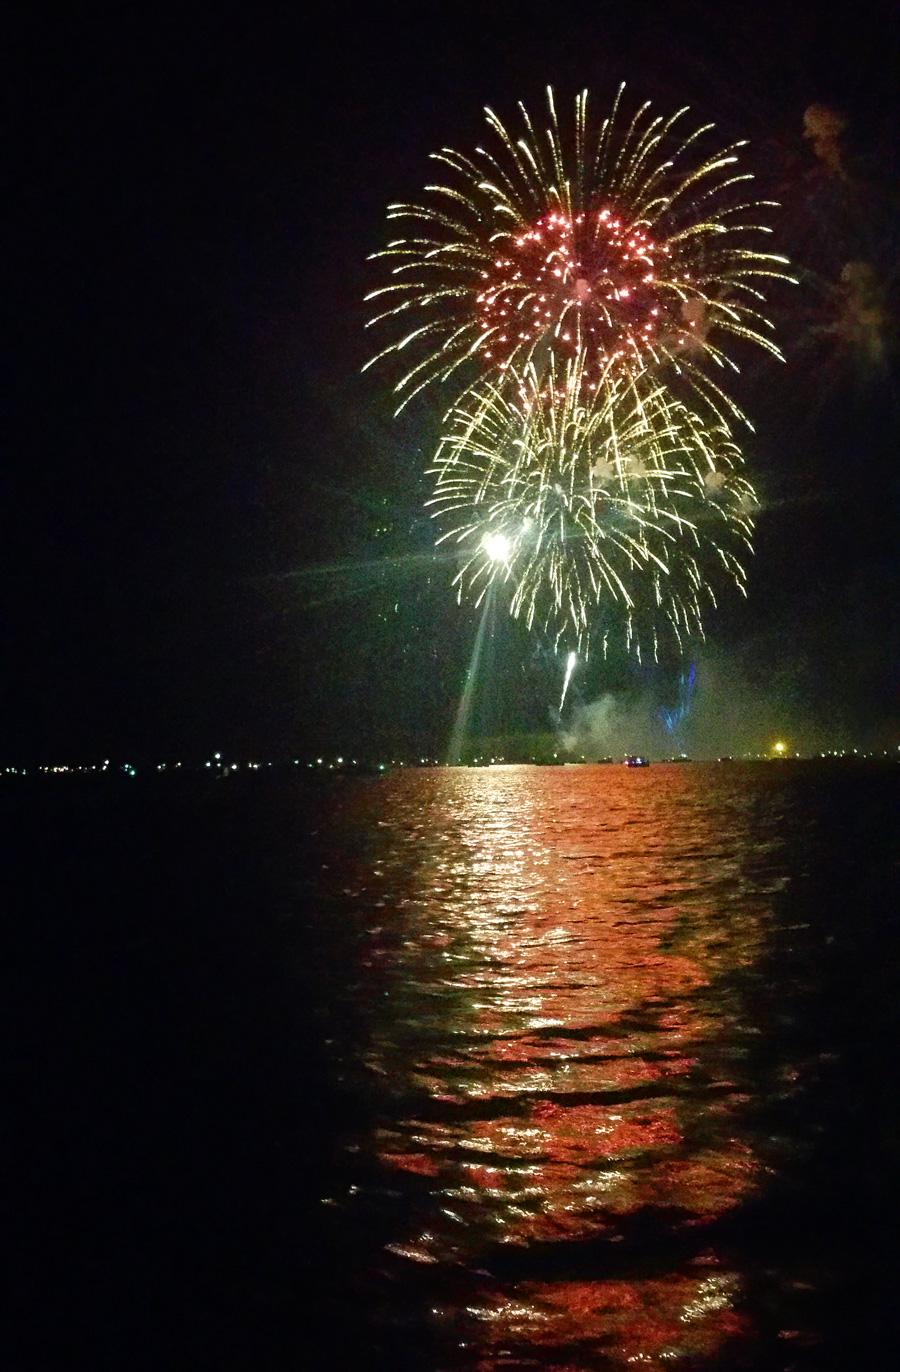 Fireworks over lake